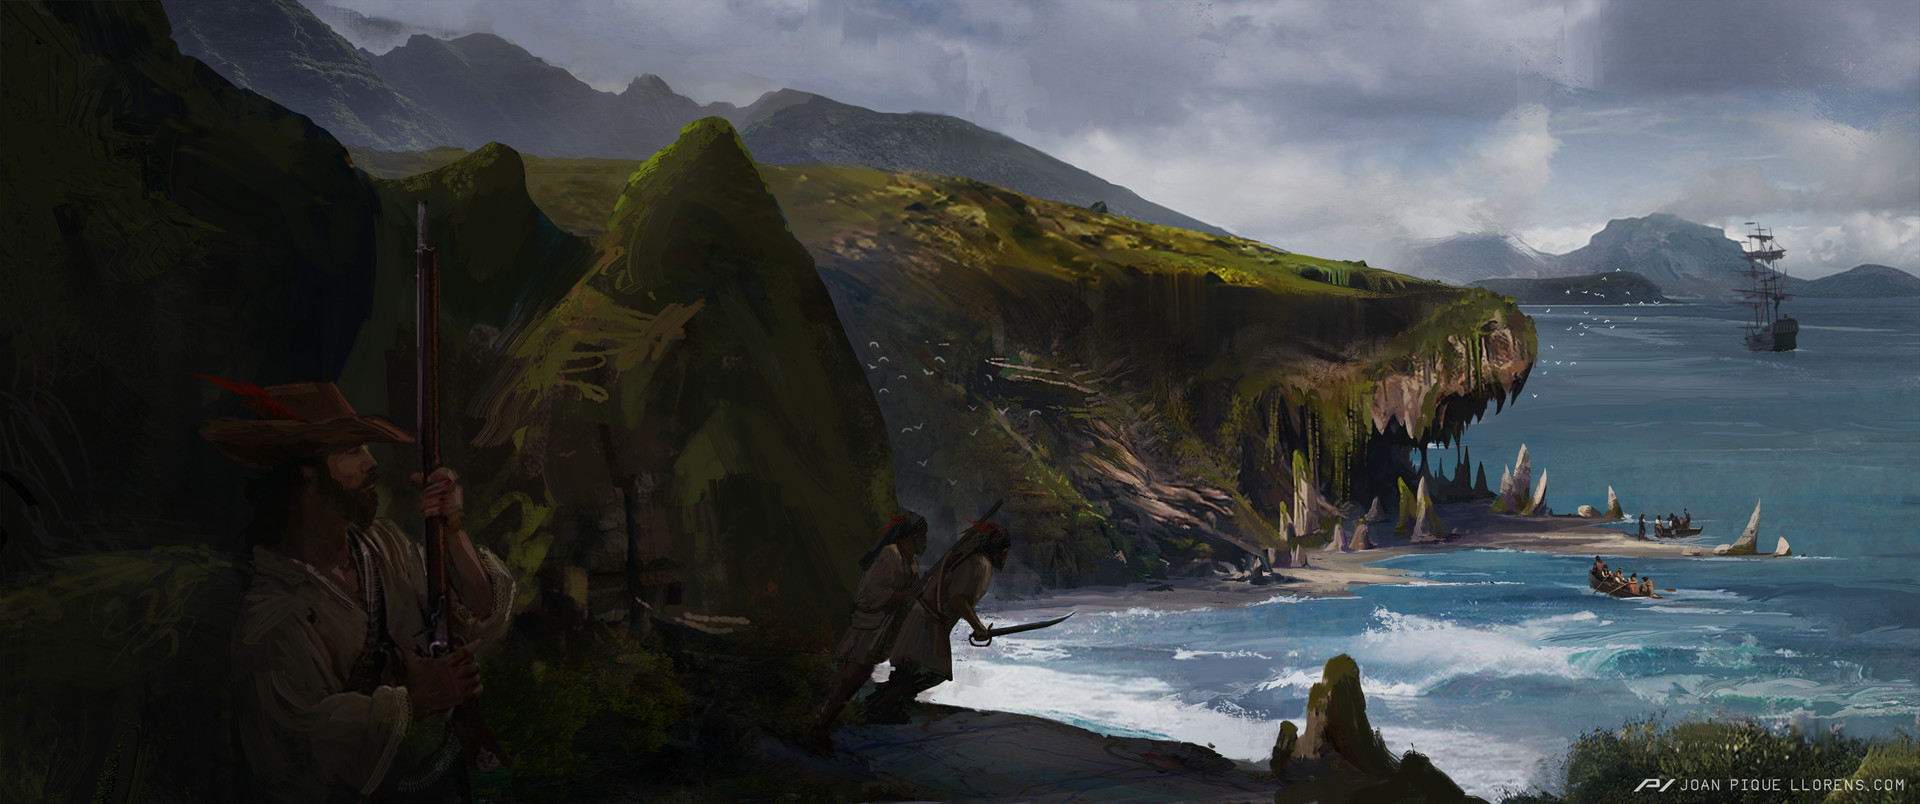 Joan pique llorens island concept 04